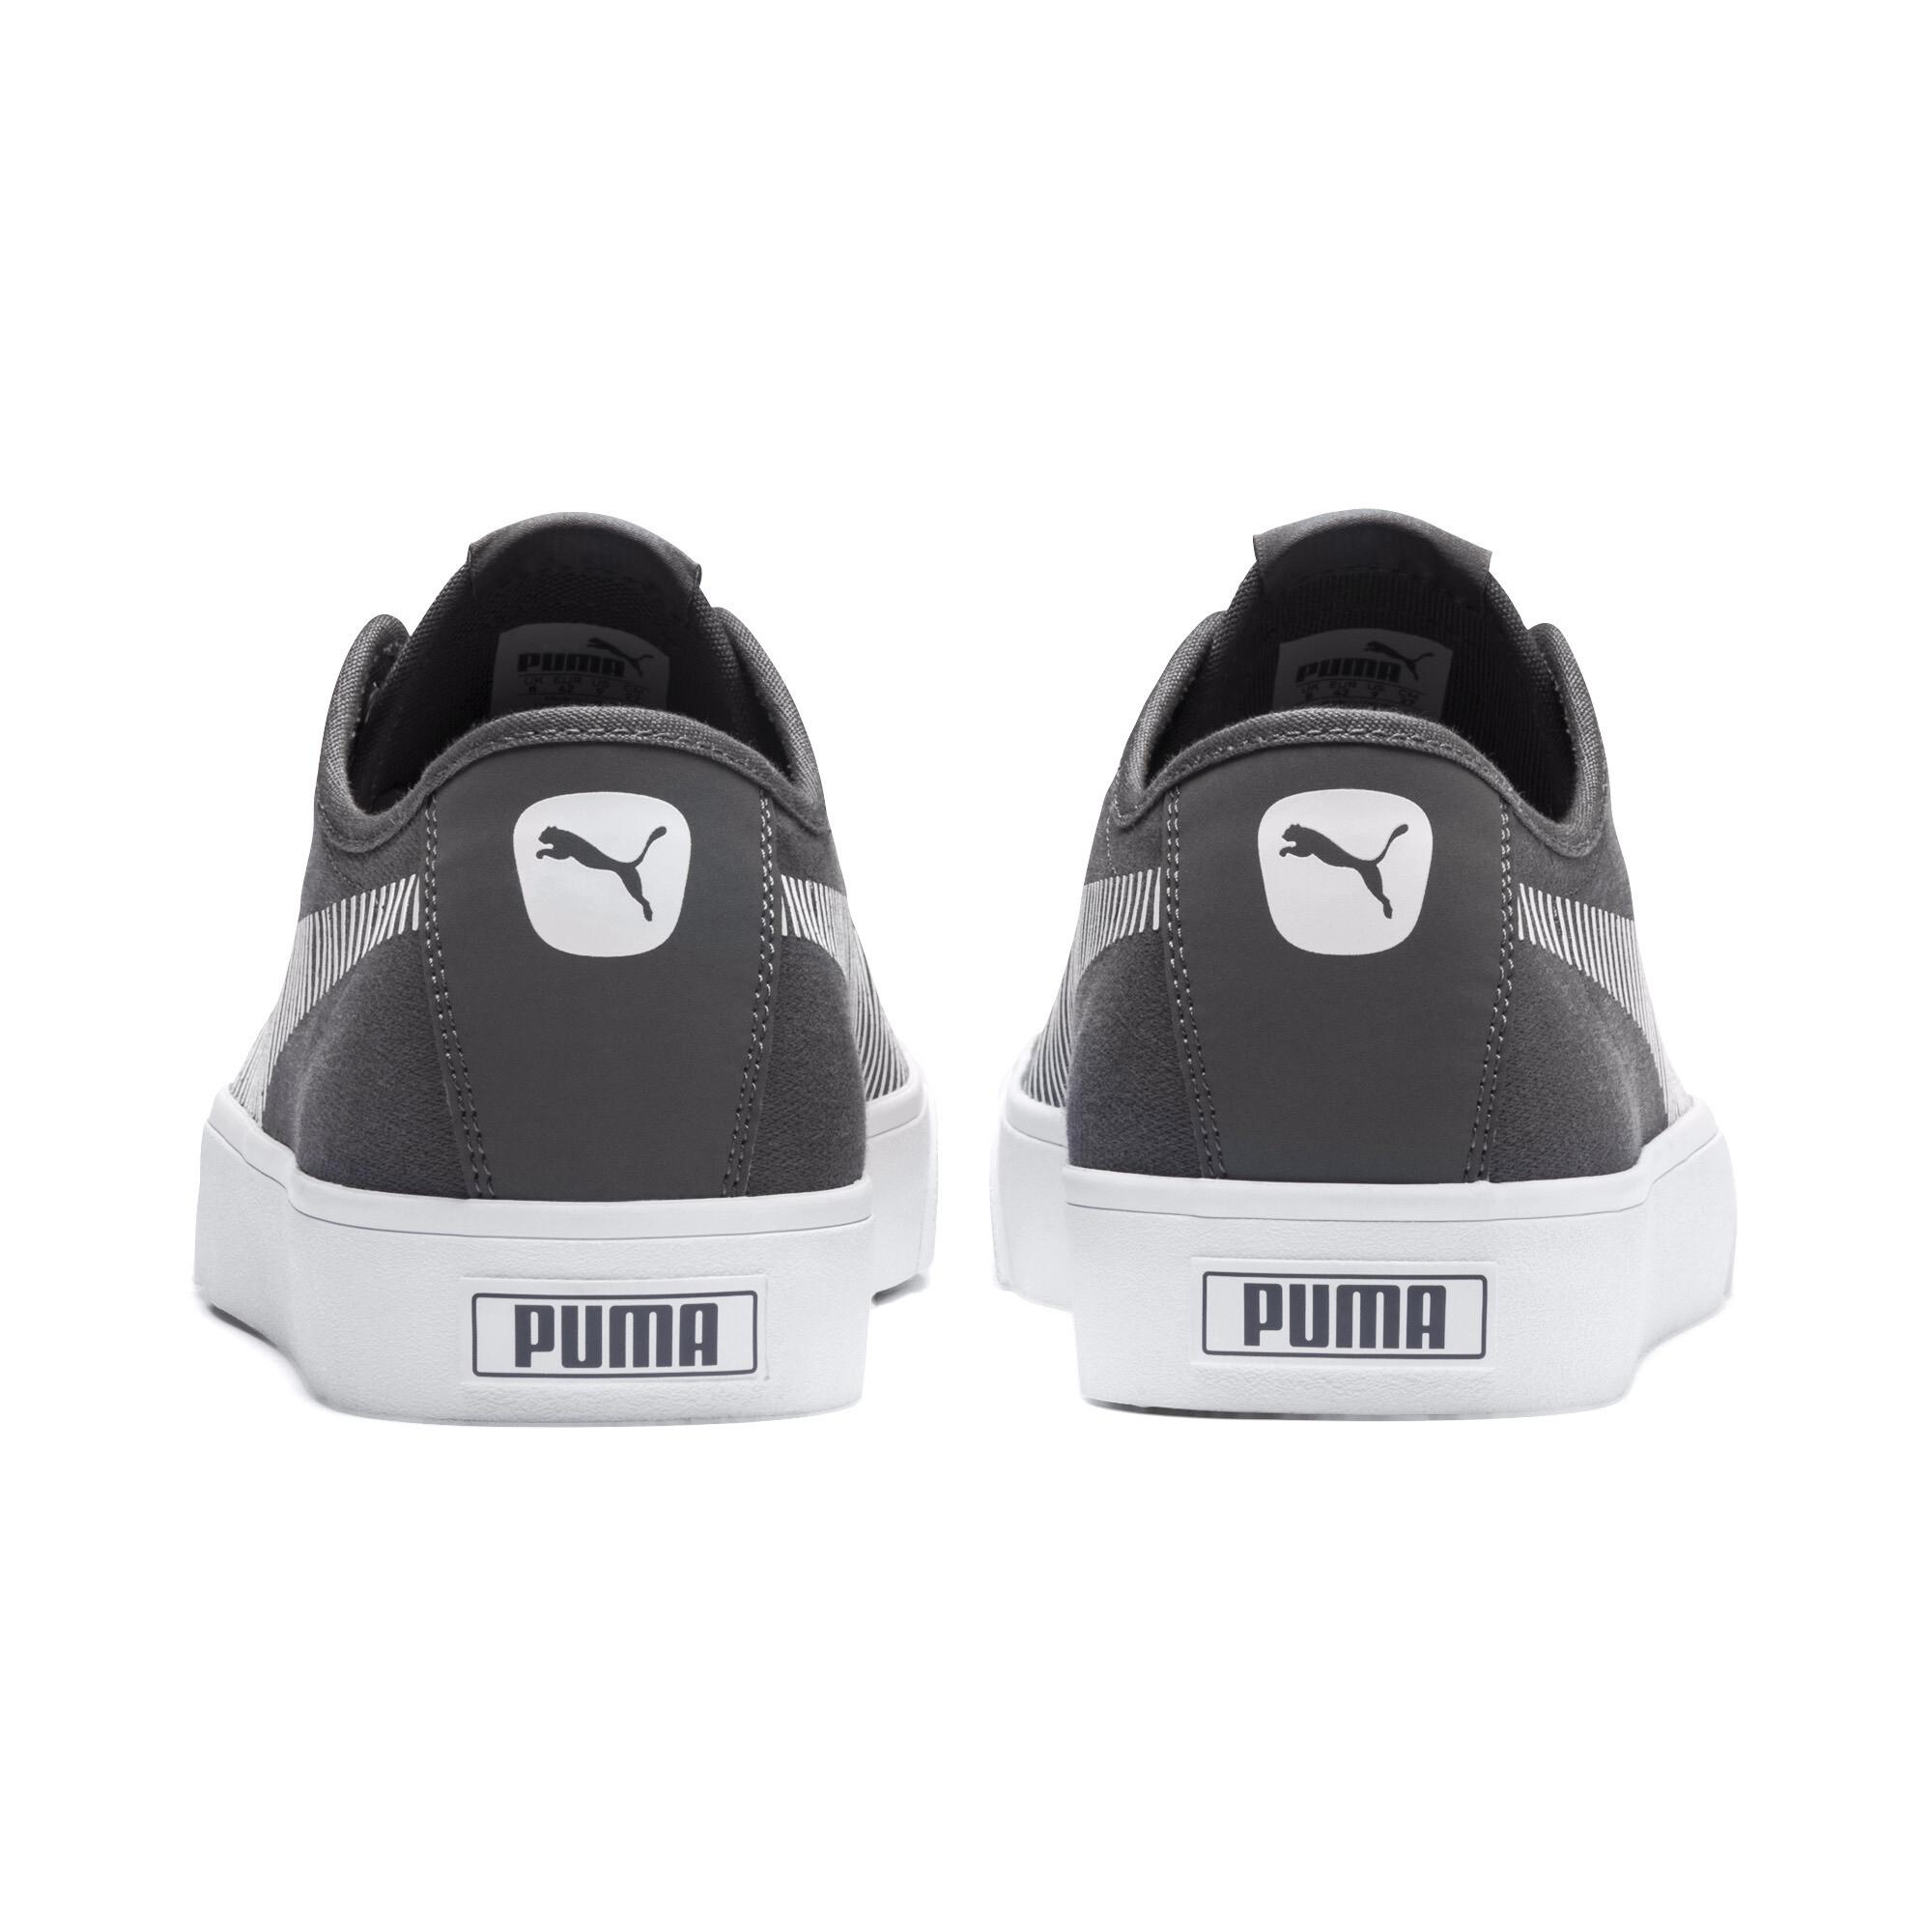 PUMA-Bari-Sneakers-Men-Shoe-Basics thumbnail 18